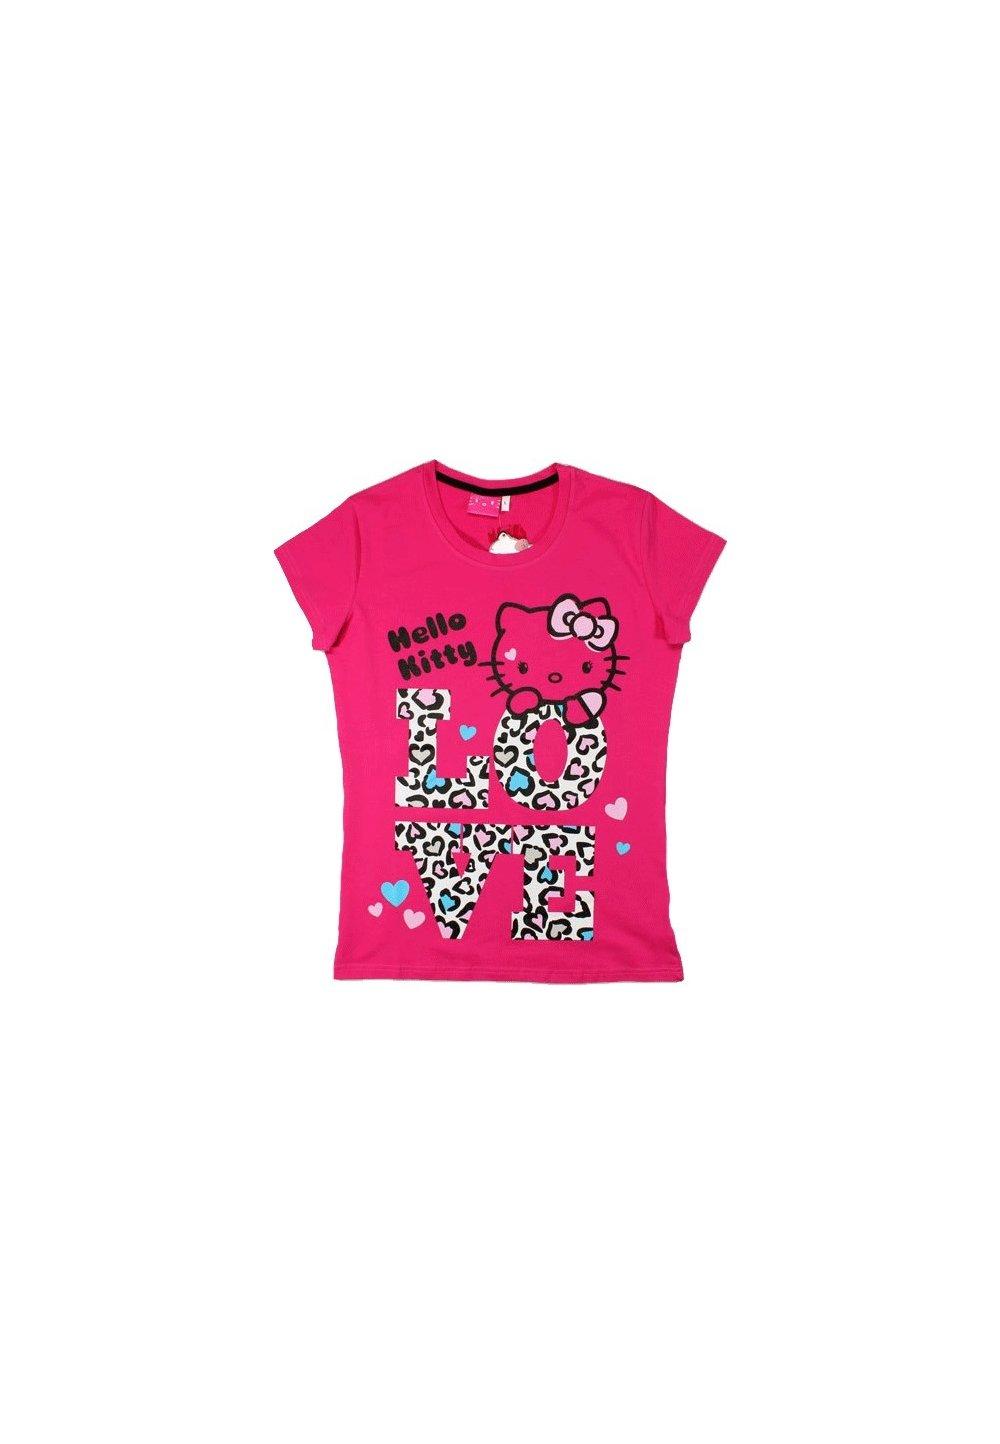 Tricou femei, Hello Kitty, roz imagine